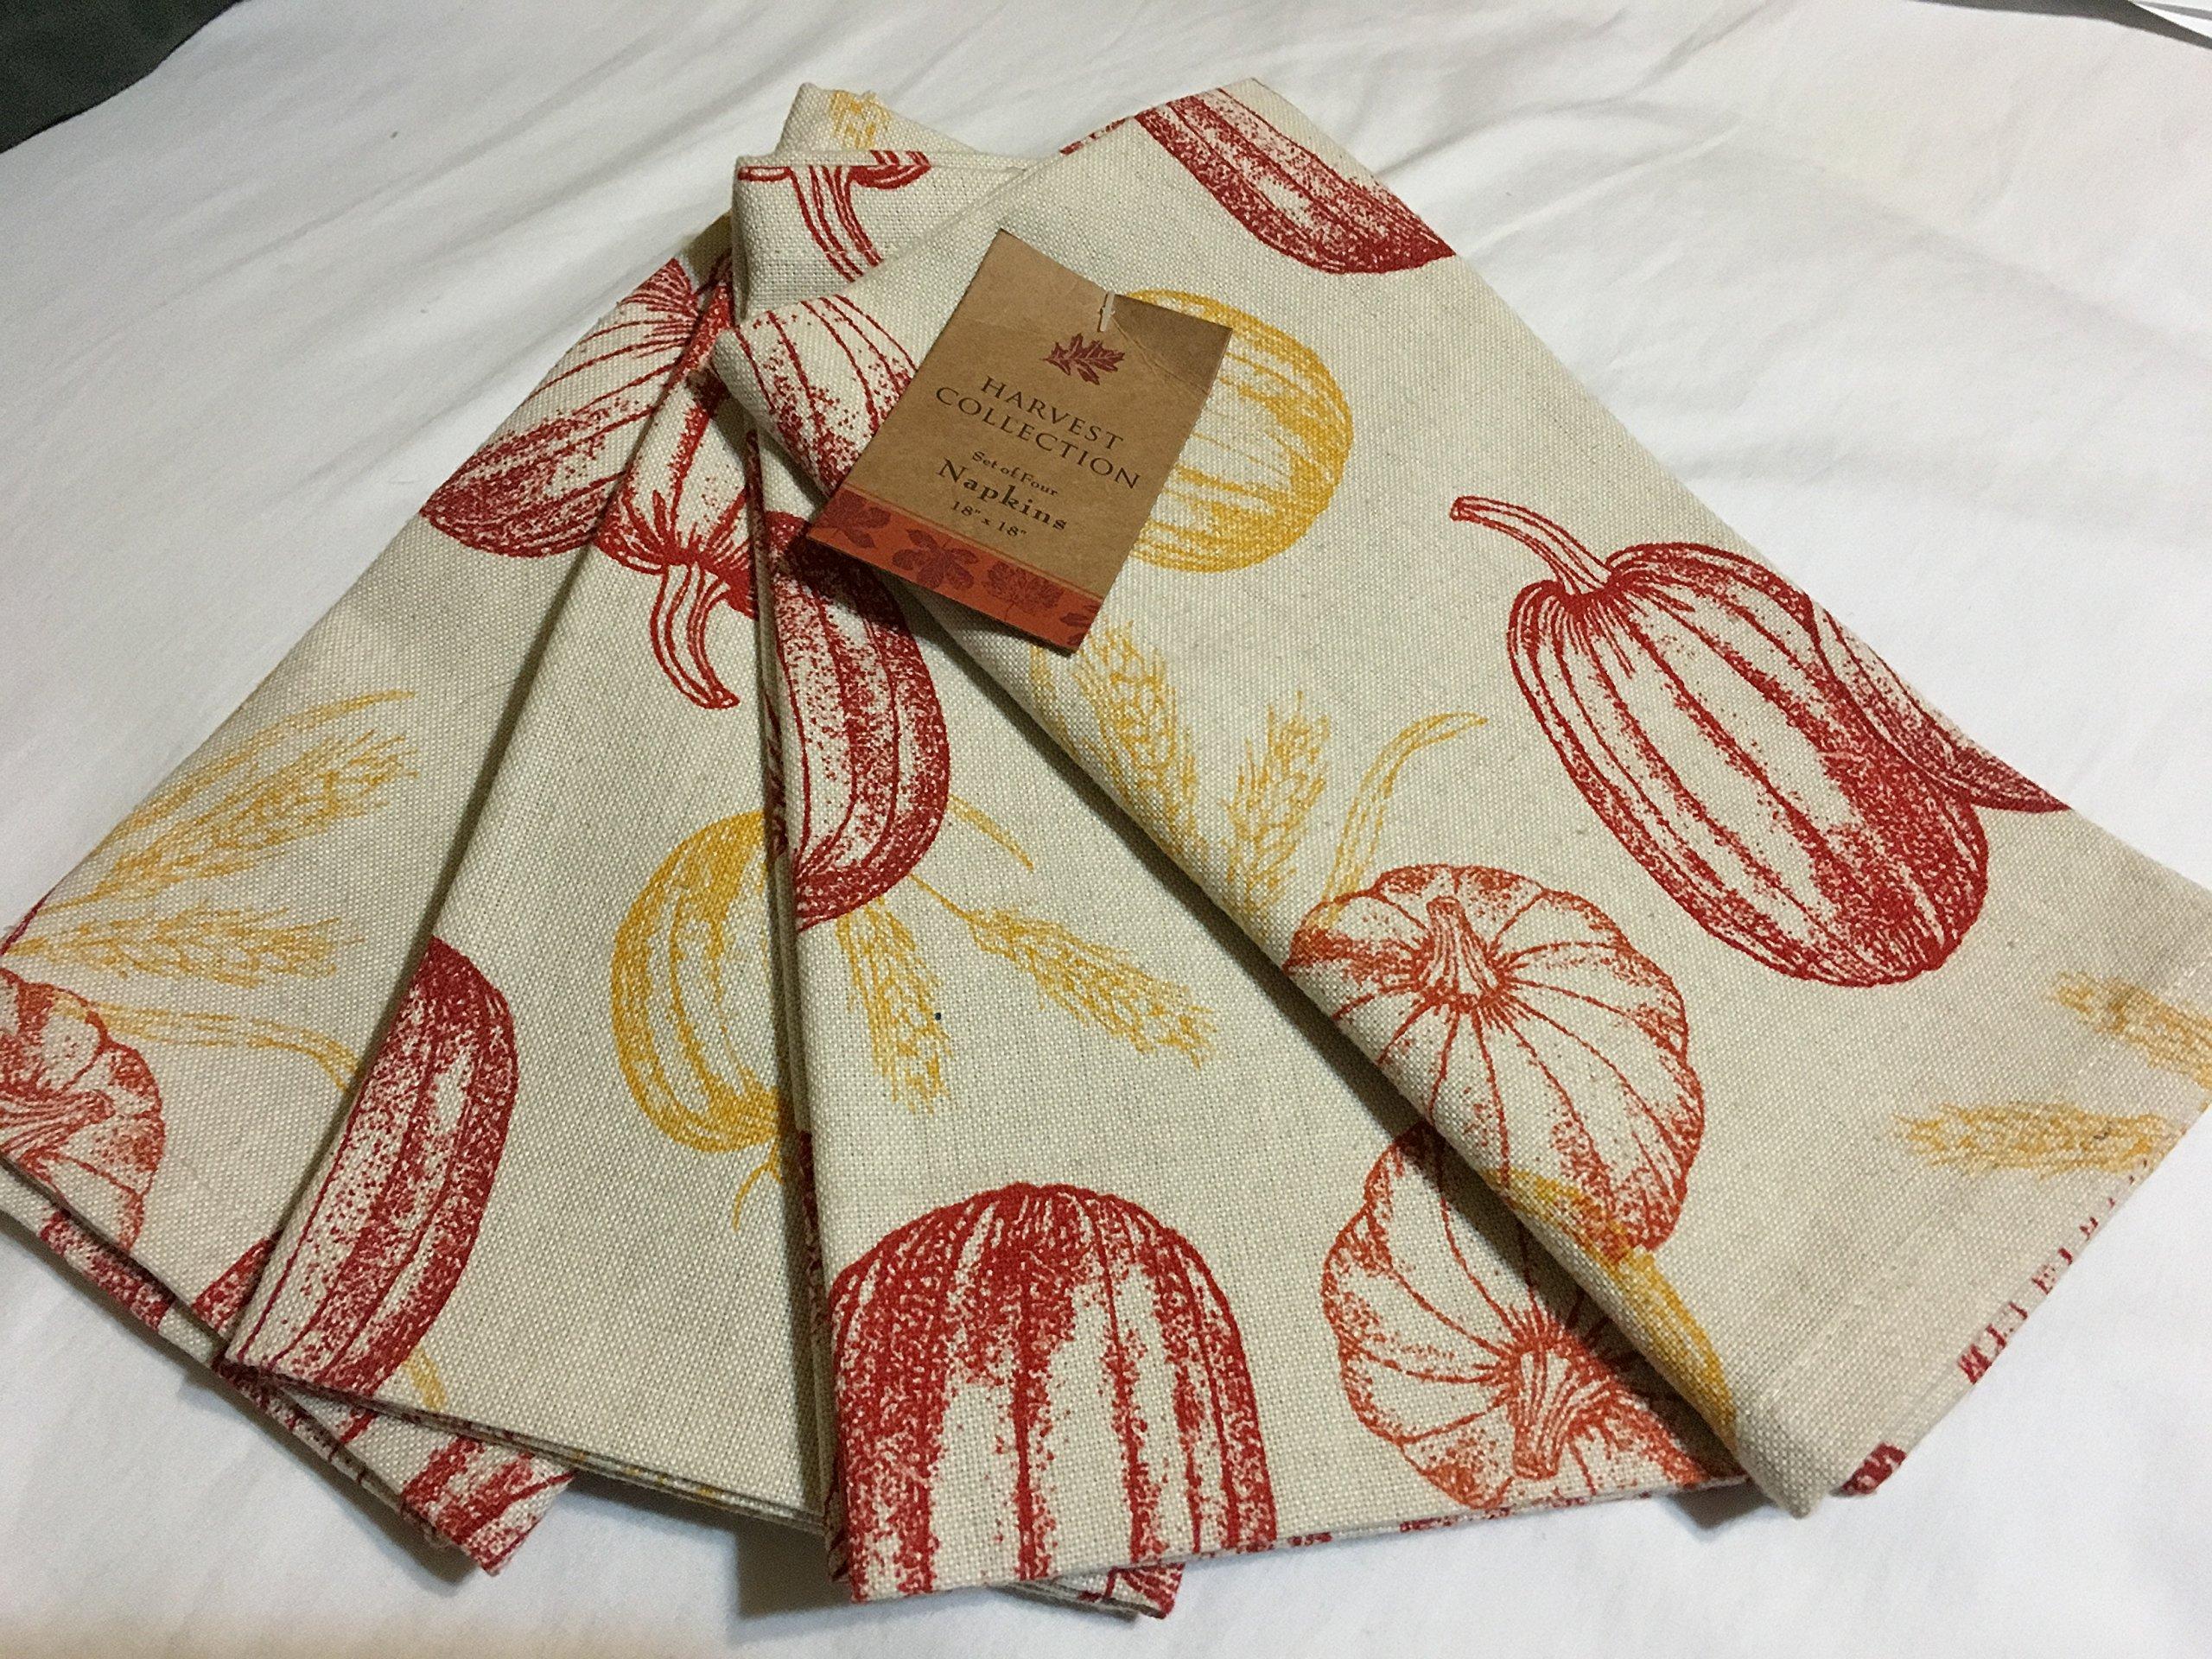 Harvest Collection Fall Pumpkin Thanksgiving Napkin Set of 4